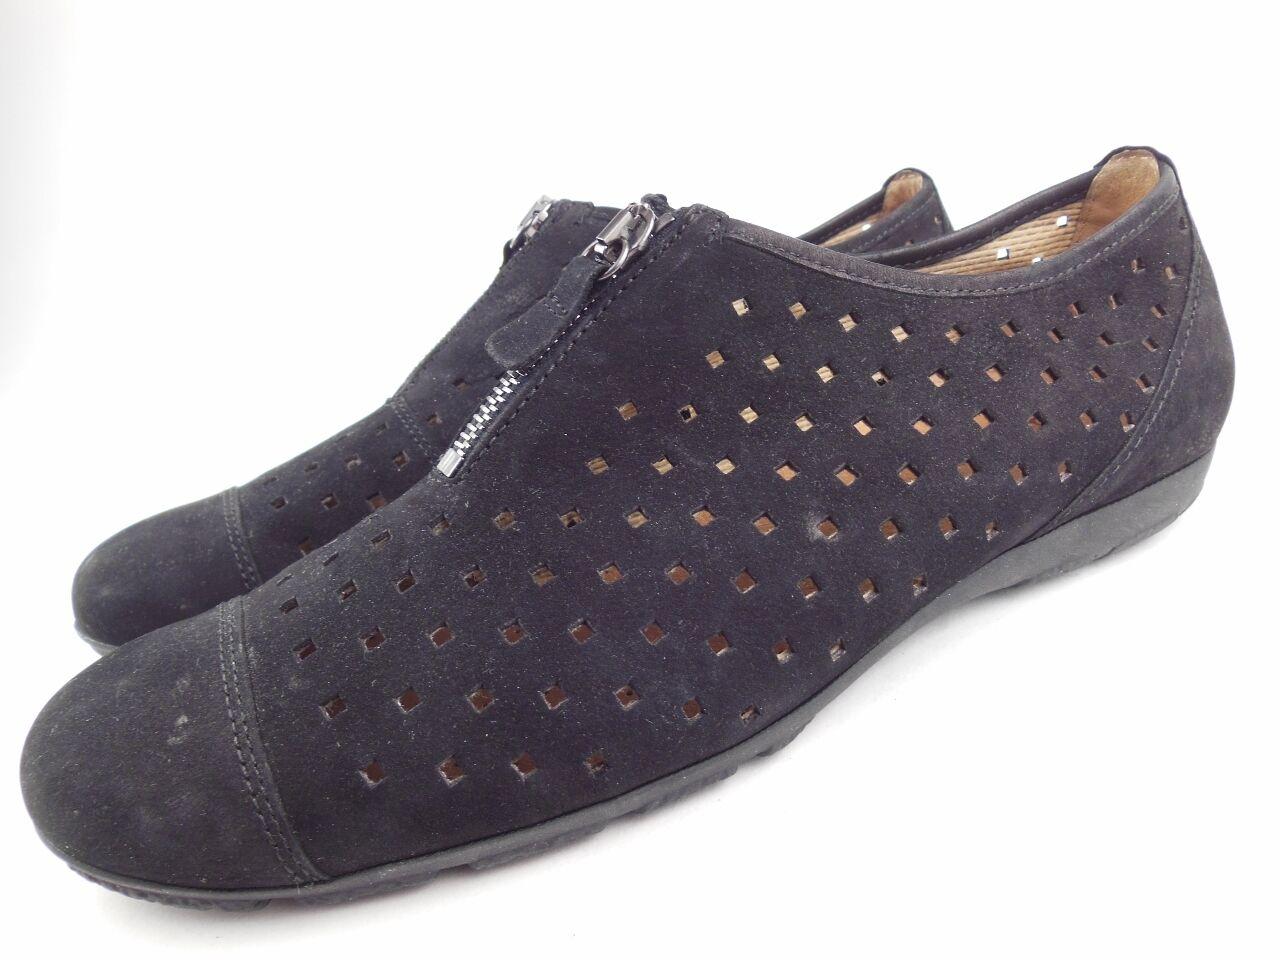 GABOR Hovercraft Black Perforated Nubuck Leather Zip Up Flats shoes Size 9